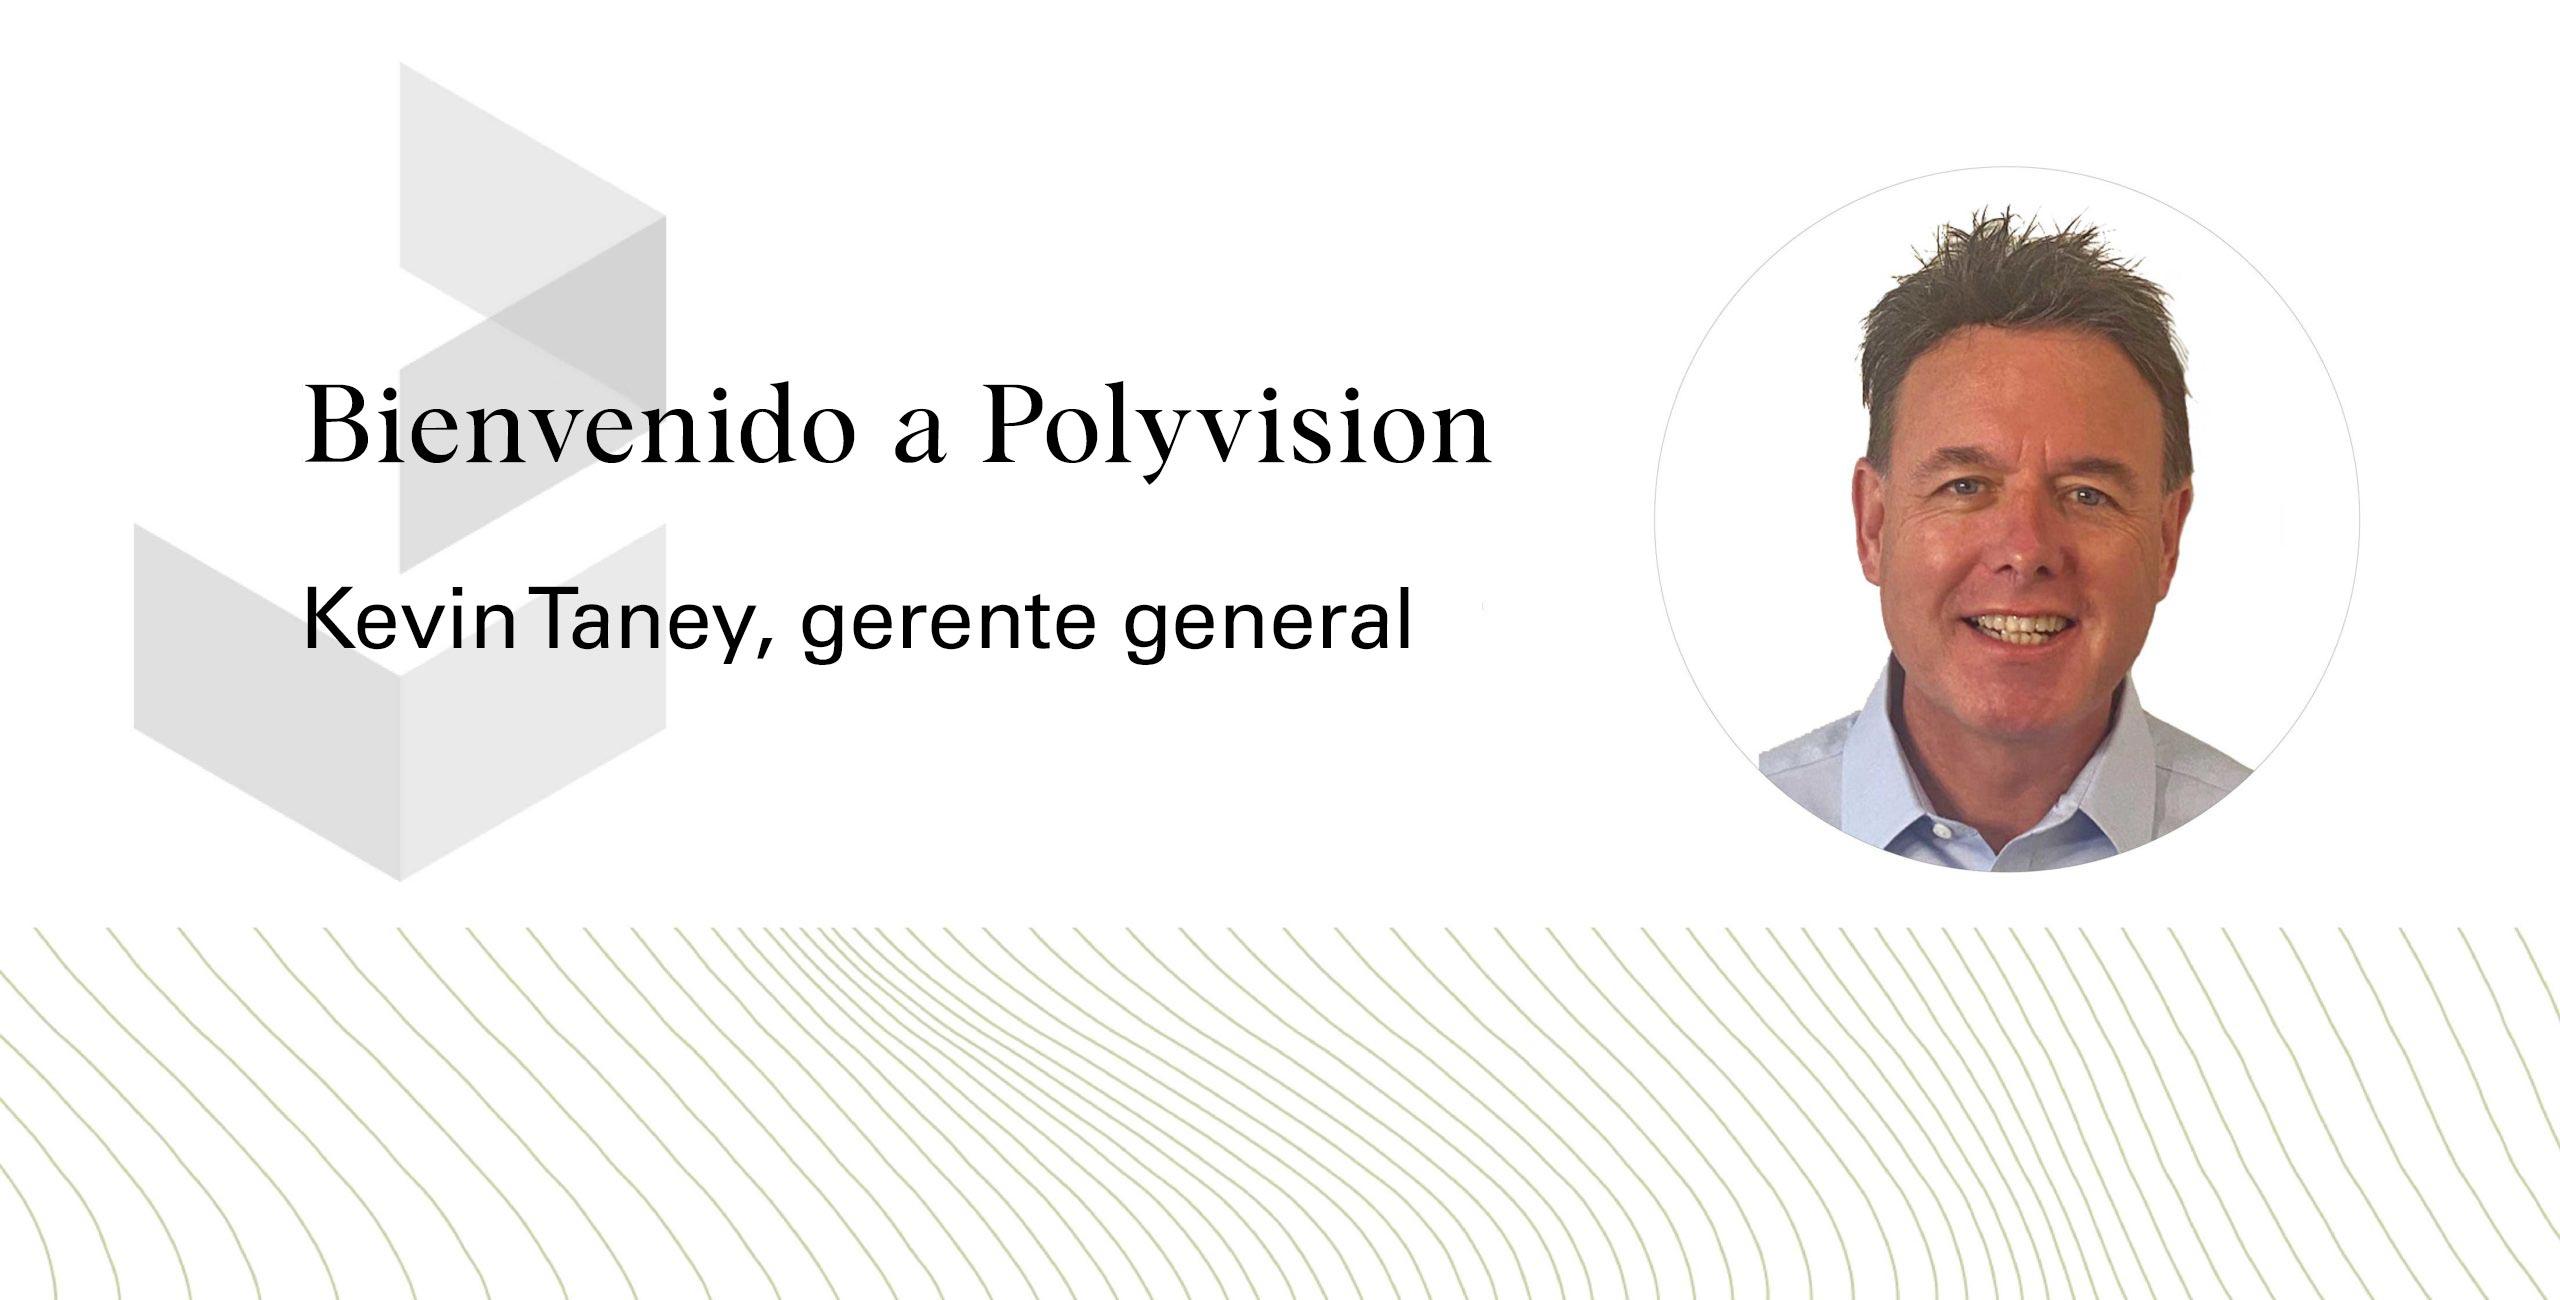 Bienvenido a PolyVision Kevin Taney, gerente general